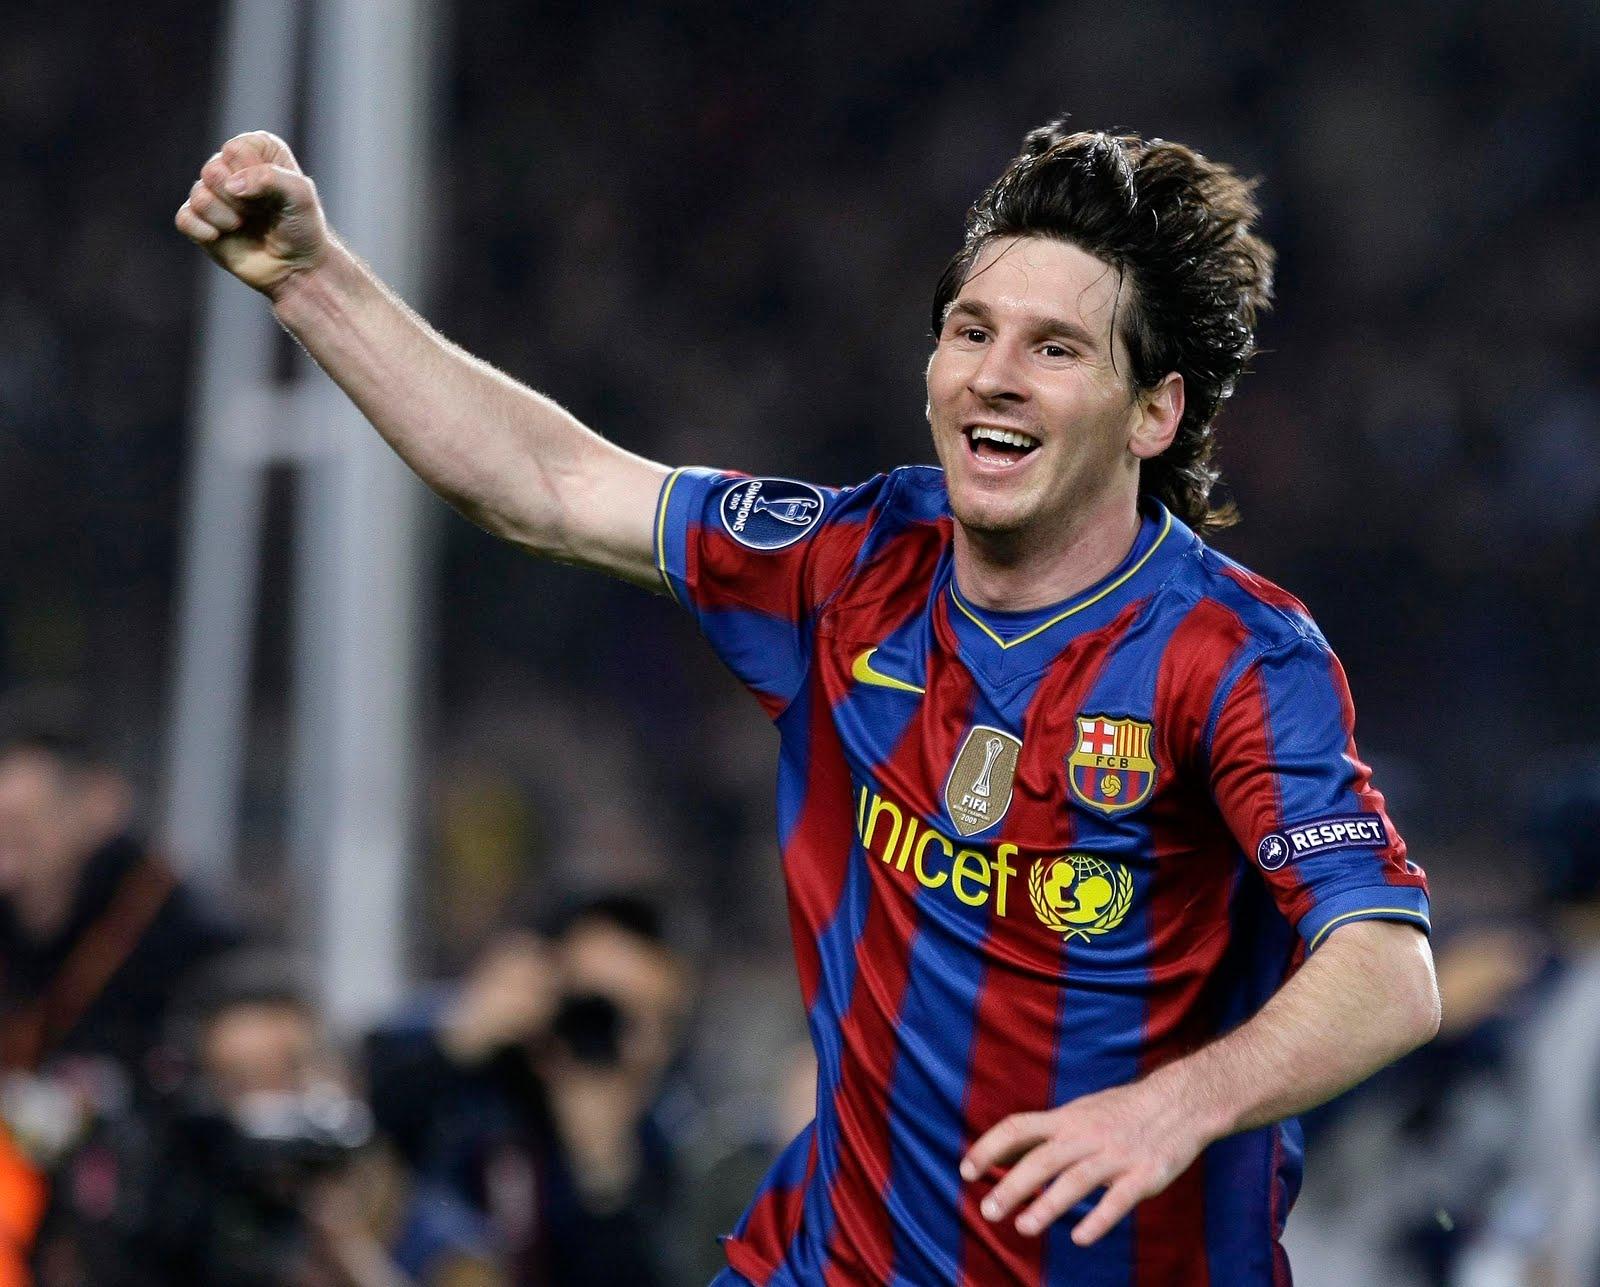 Top Footballer Wallpaper Lionel Messi Hq Wallpapers